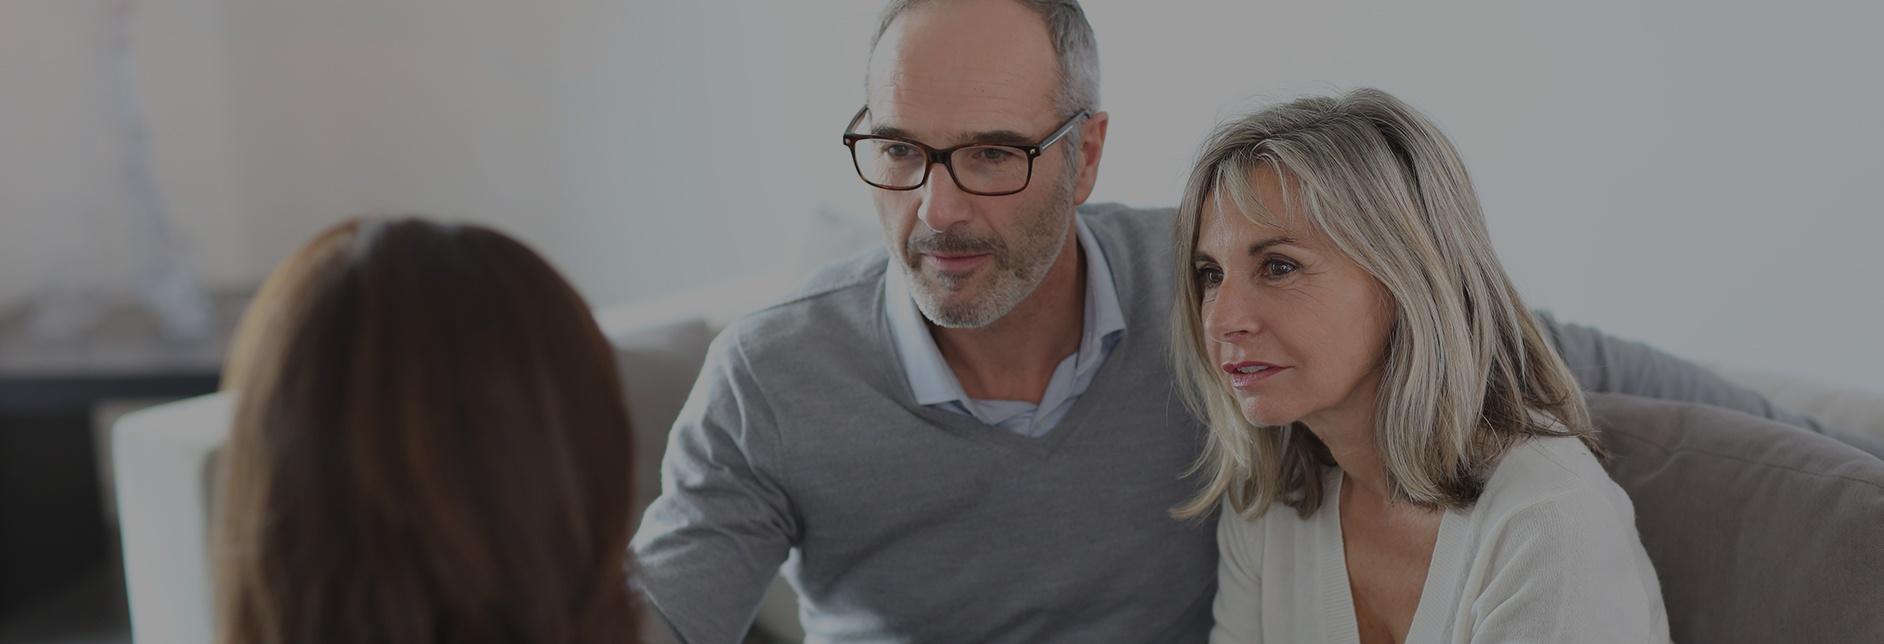 Parents and Guardian